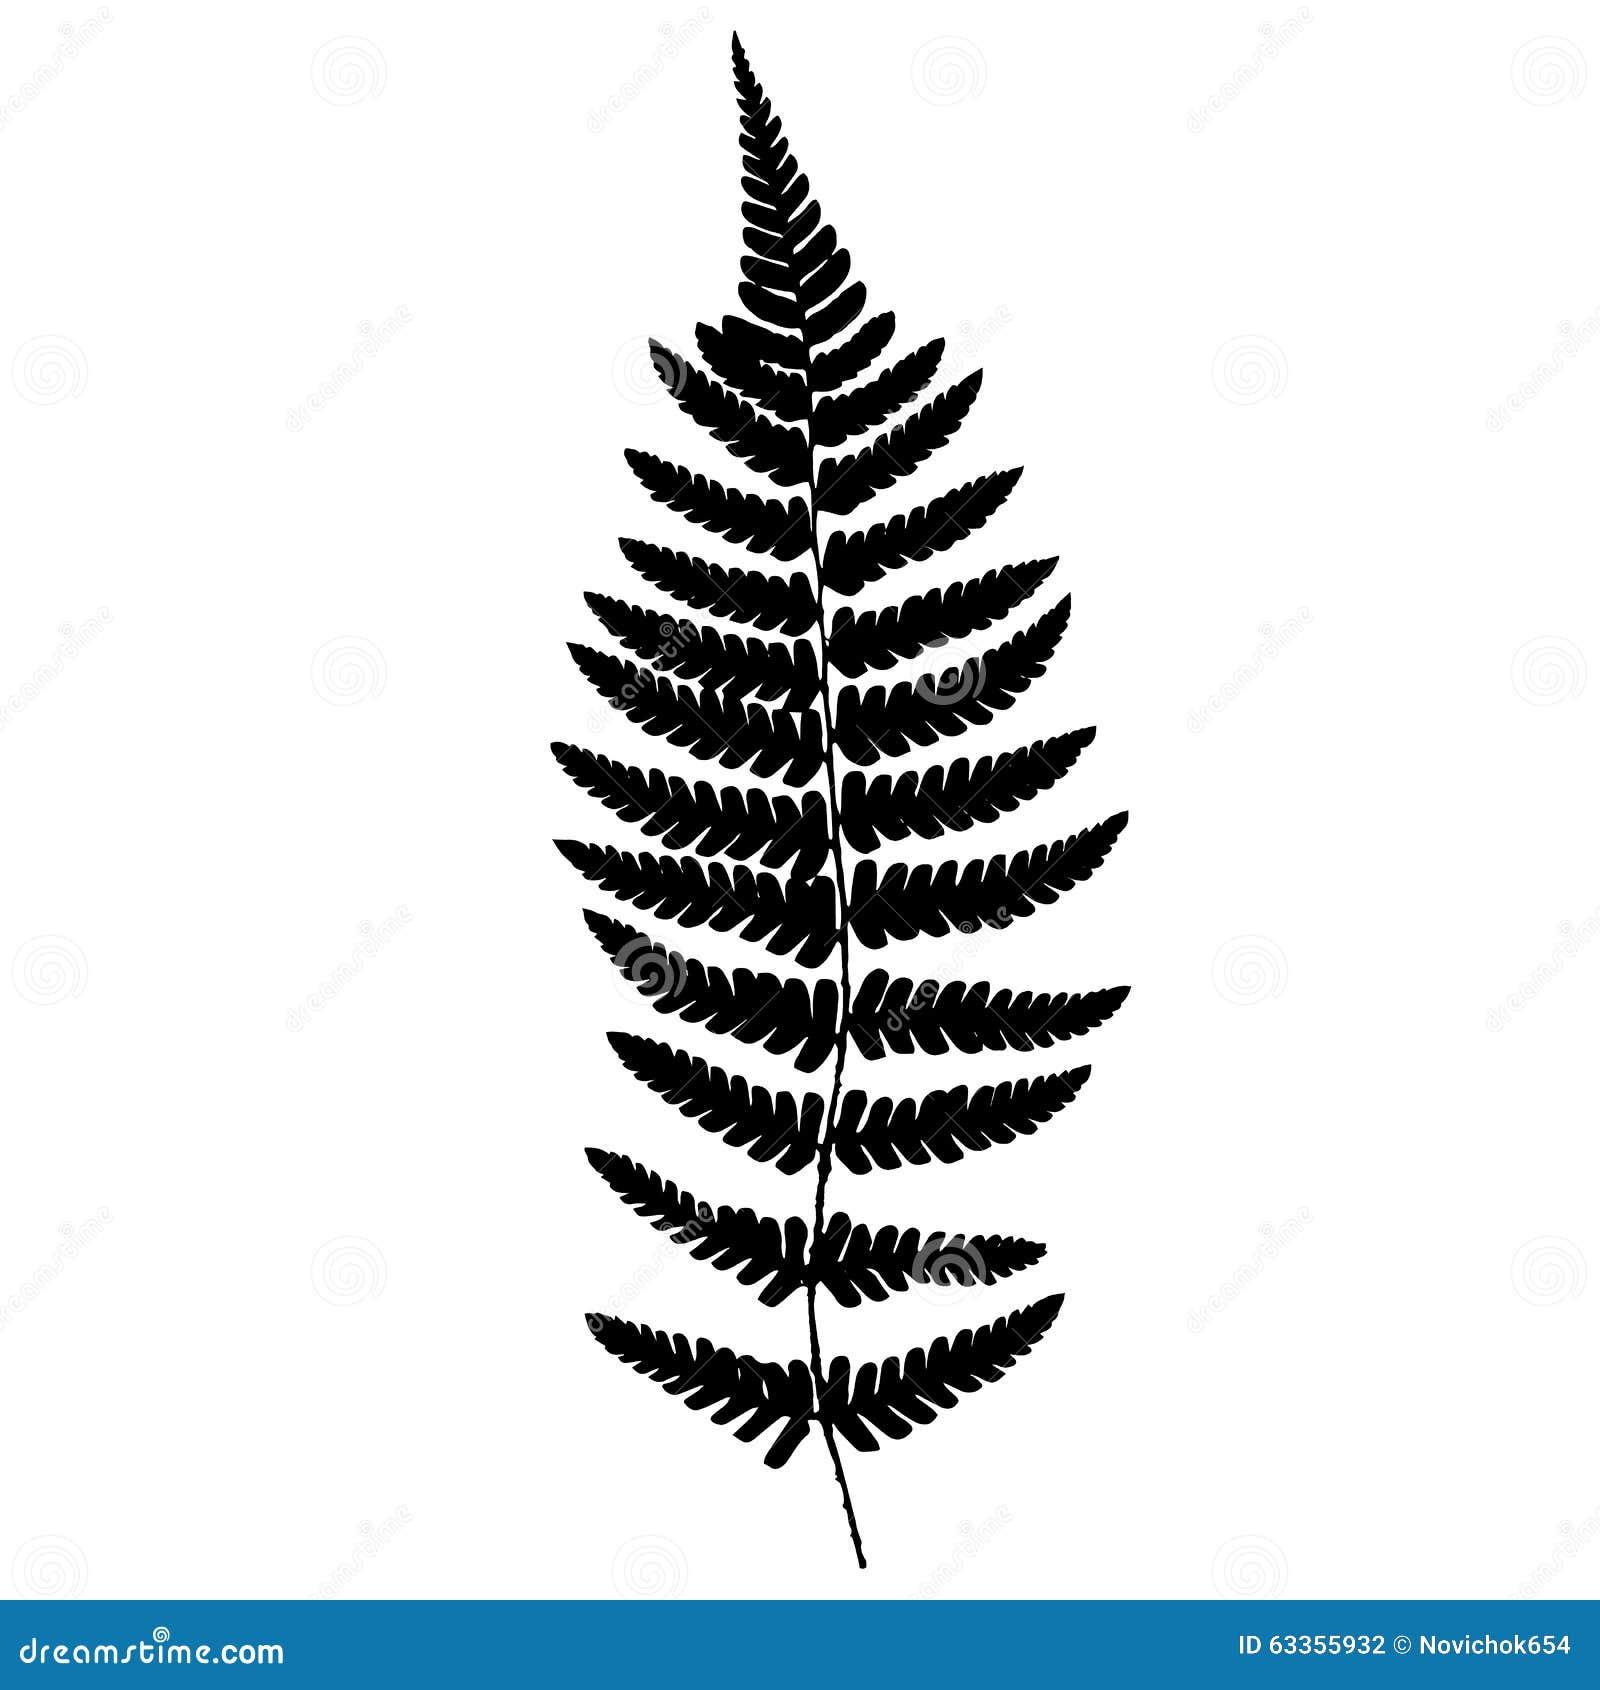 Stock Illustration Fern Frond Black Silhouette Vector Illustration Image63355932 on Spring Season Clipart Black And White Clip